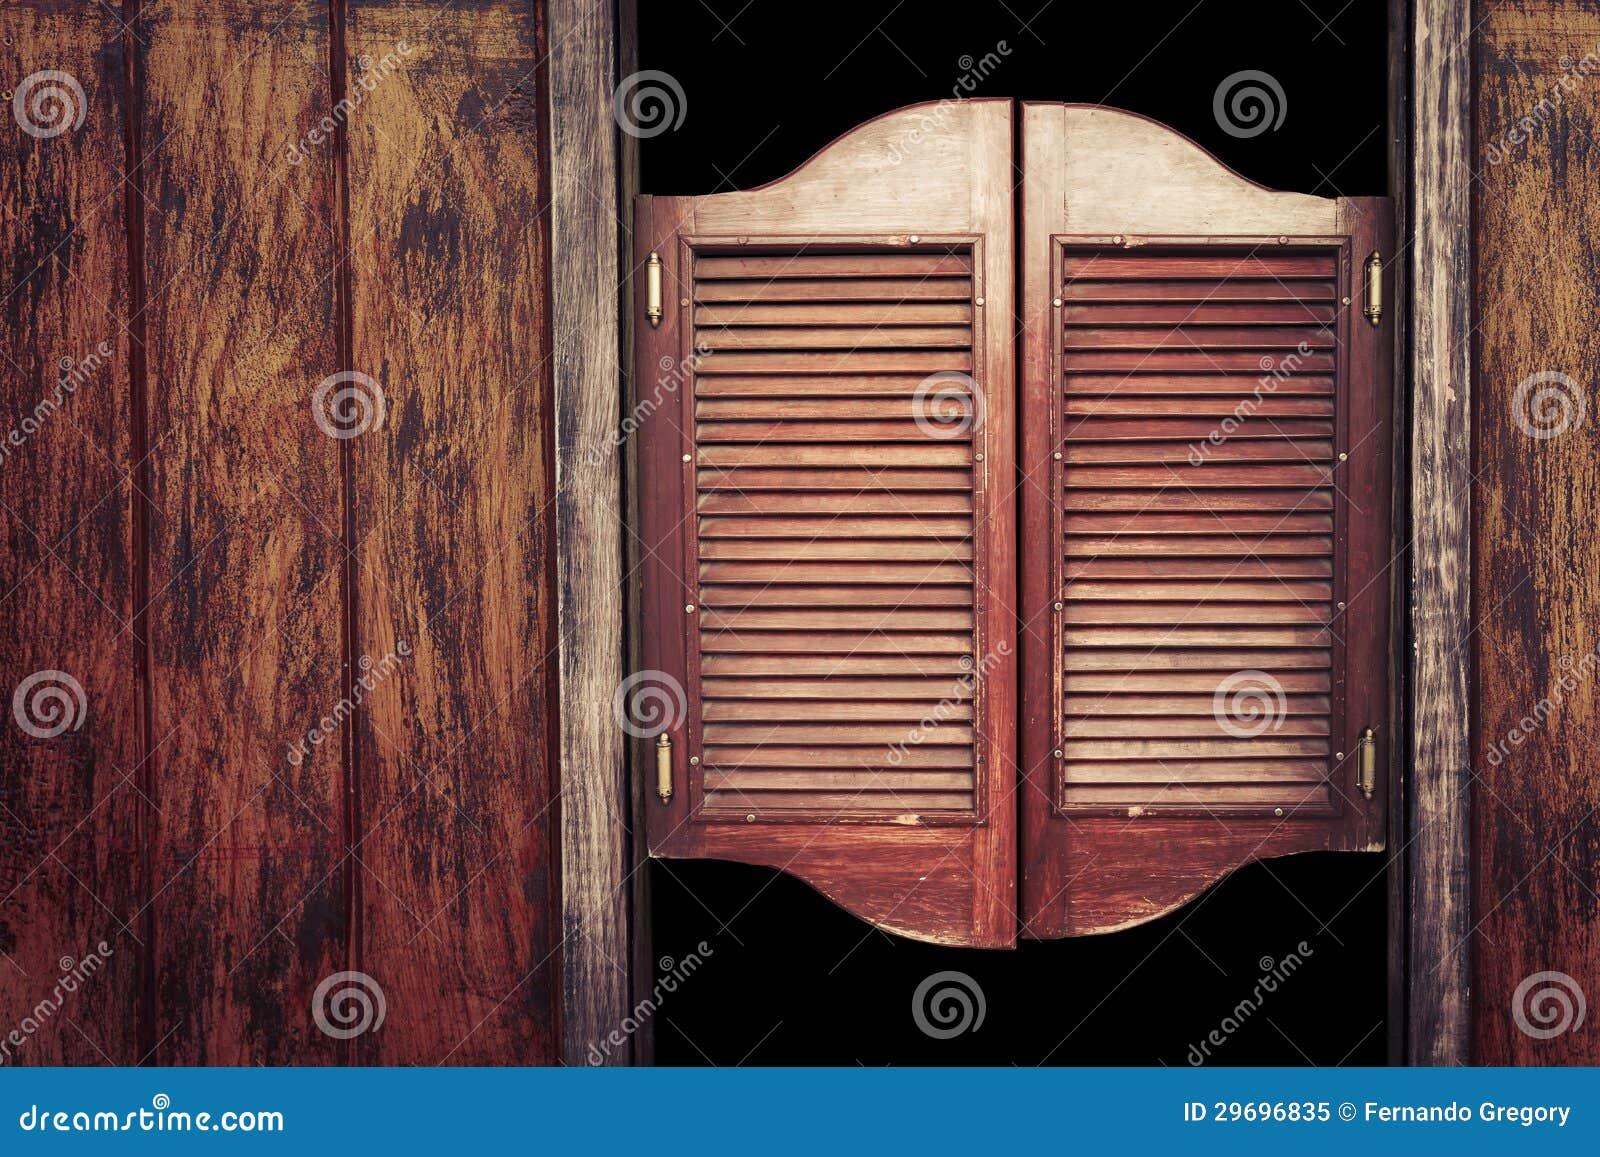 Old vintage wooden saloon doors stock image image 29696835 for Porte de saloon western